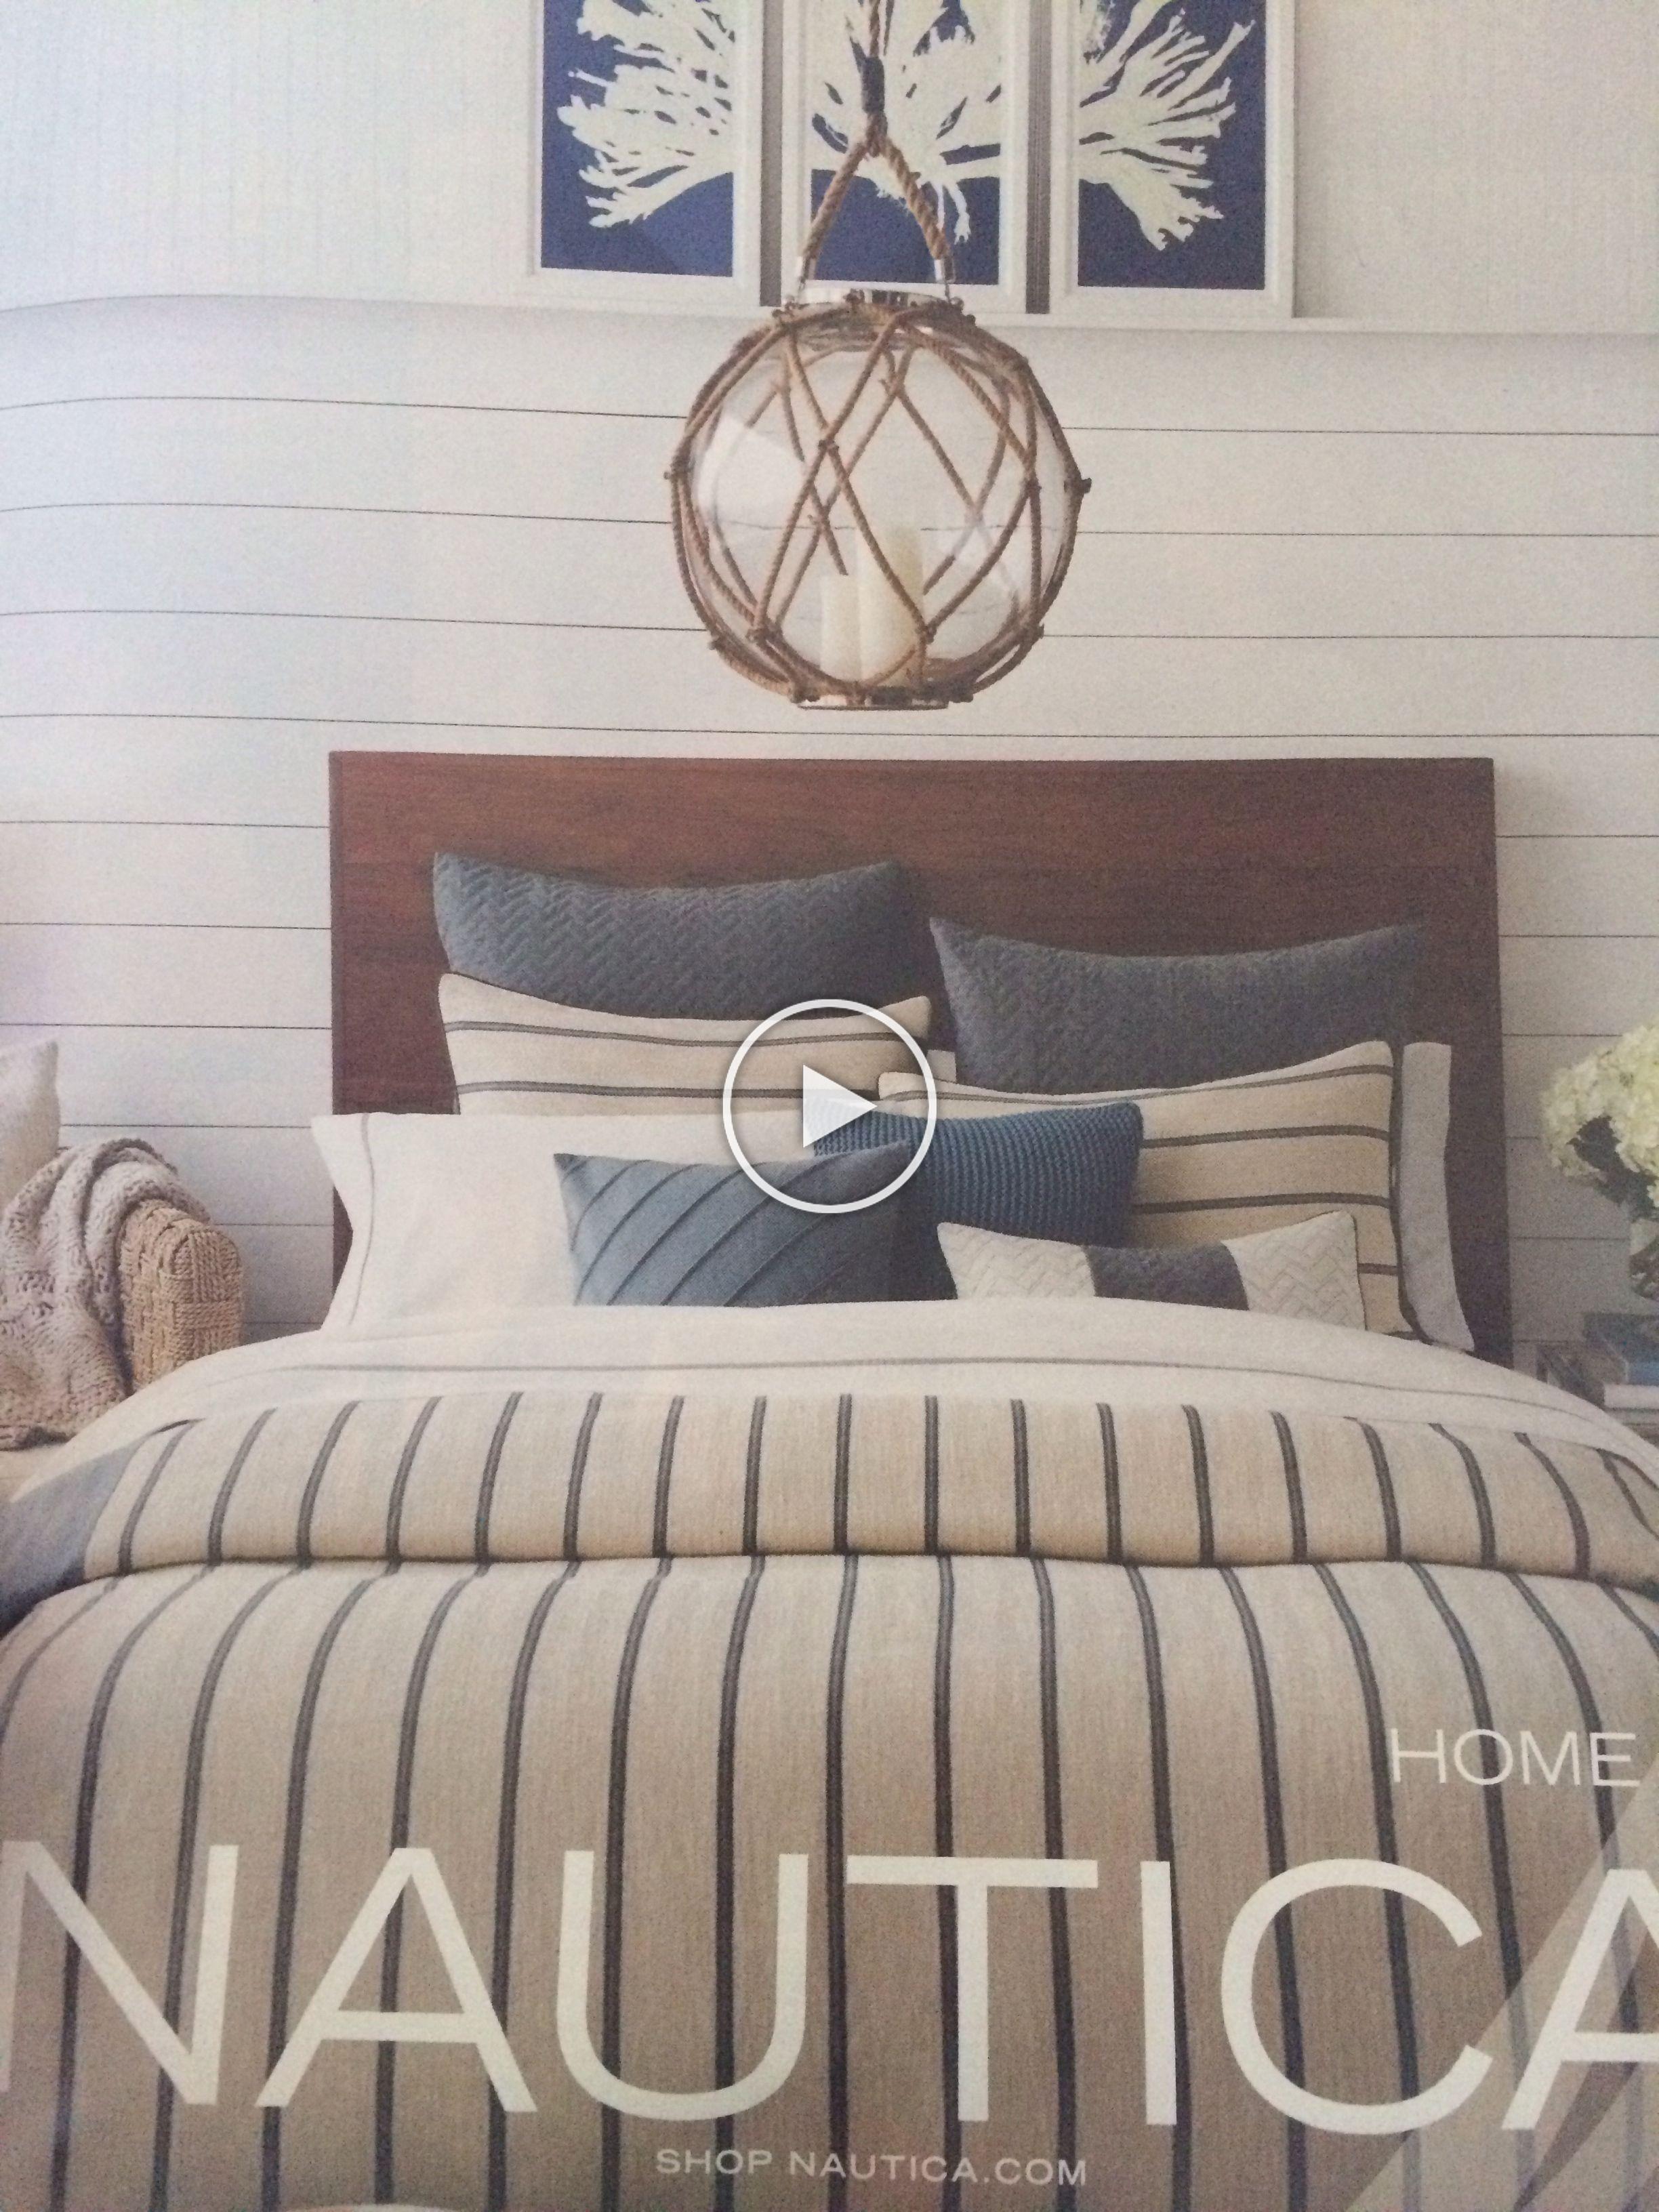 Nautical bedroom bedding lighting in 2020 Nautical